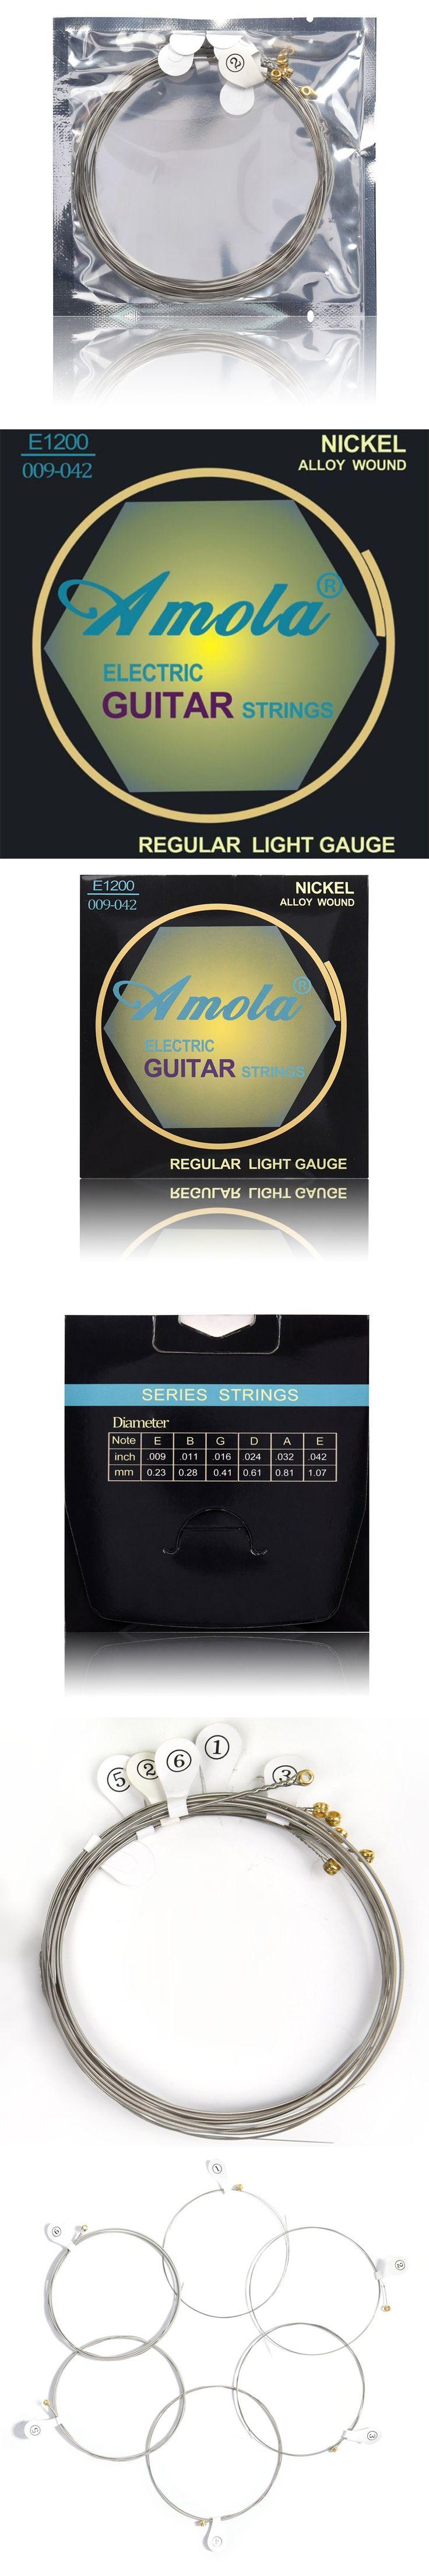 Amola E1200 .009-.042 Electric guitar strings Super Light musical instrument guitar parts accessories wholesale